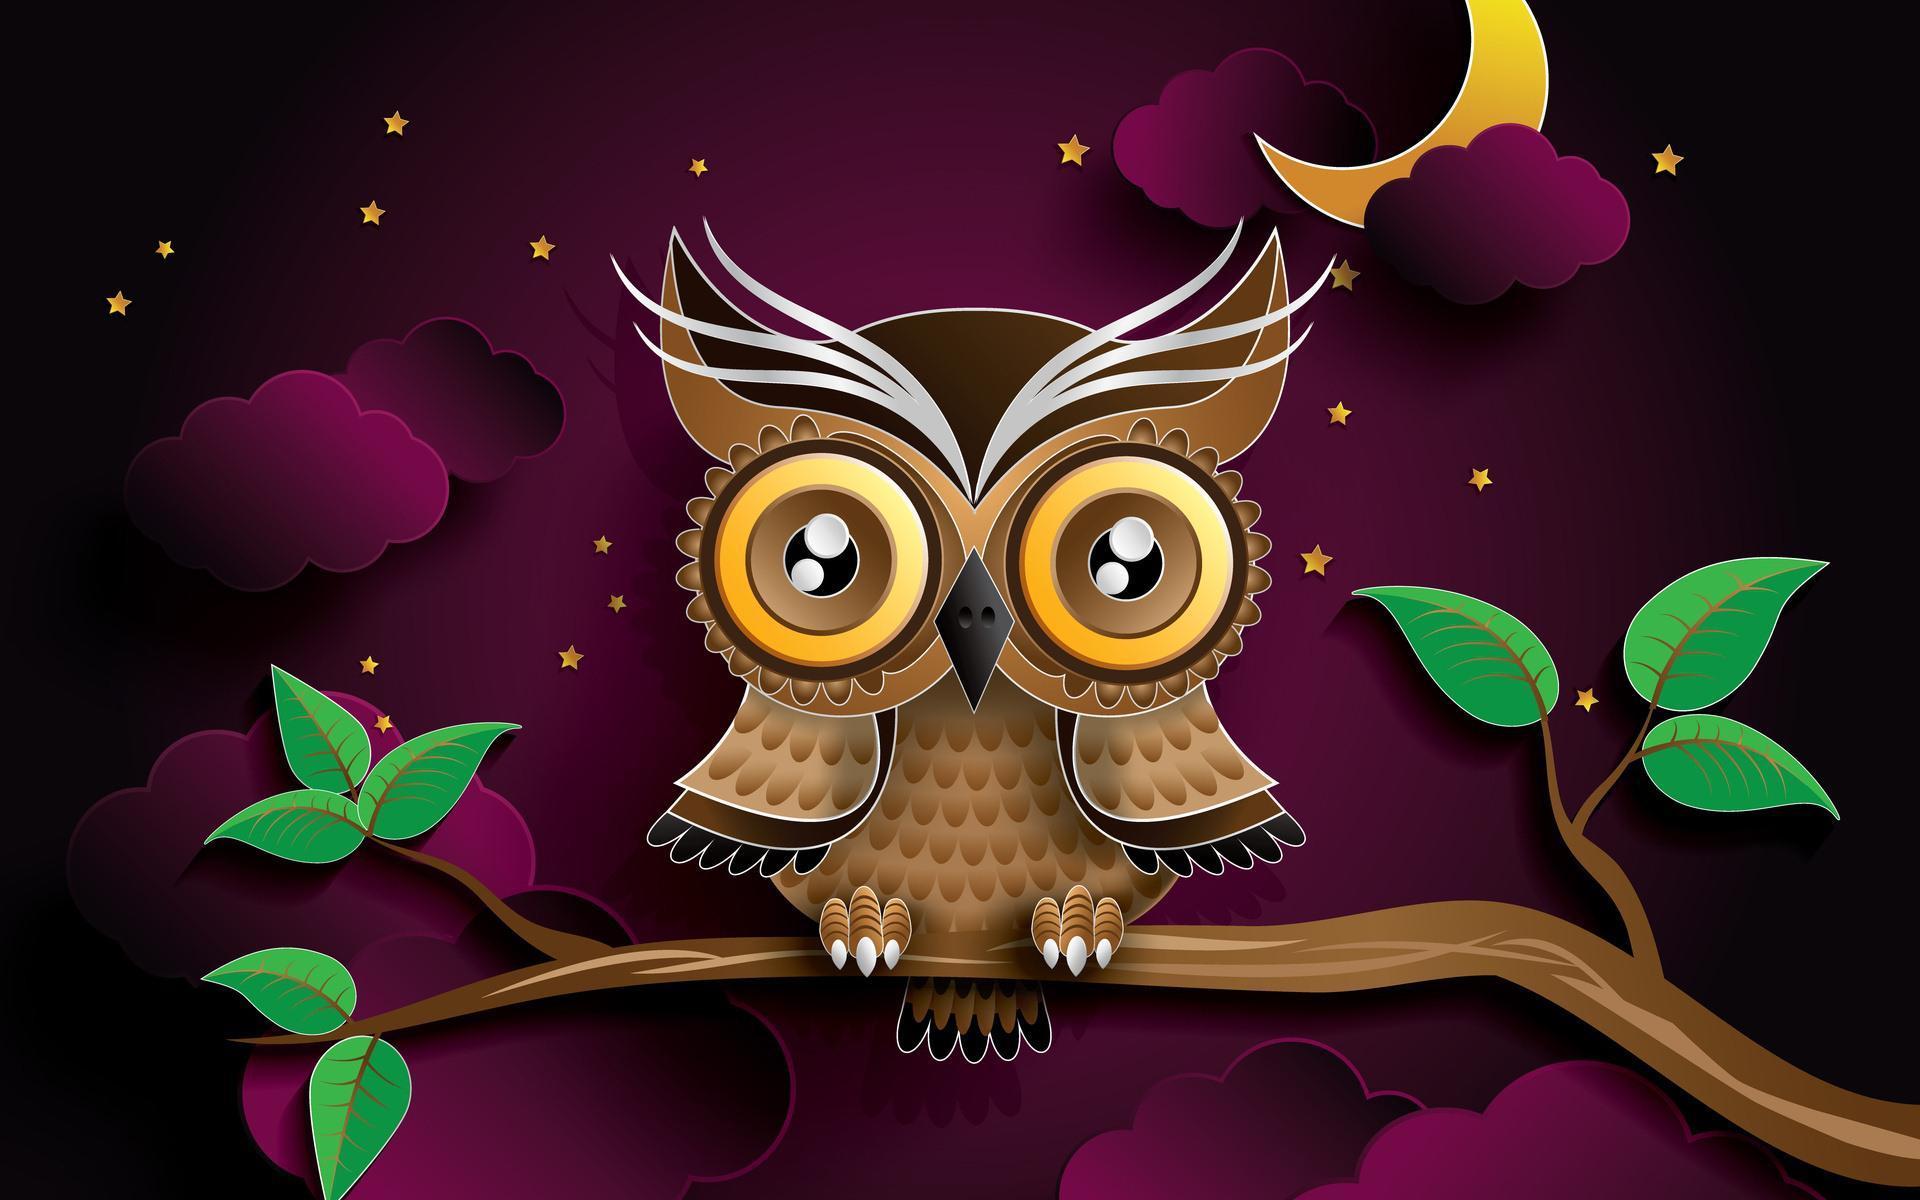 owl butterfly diagram strong winds cute halloween wallpaper